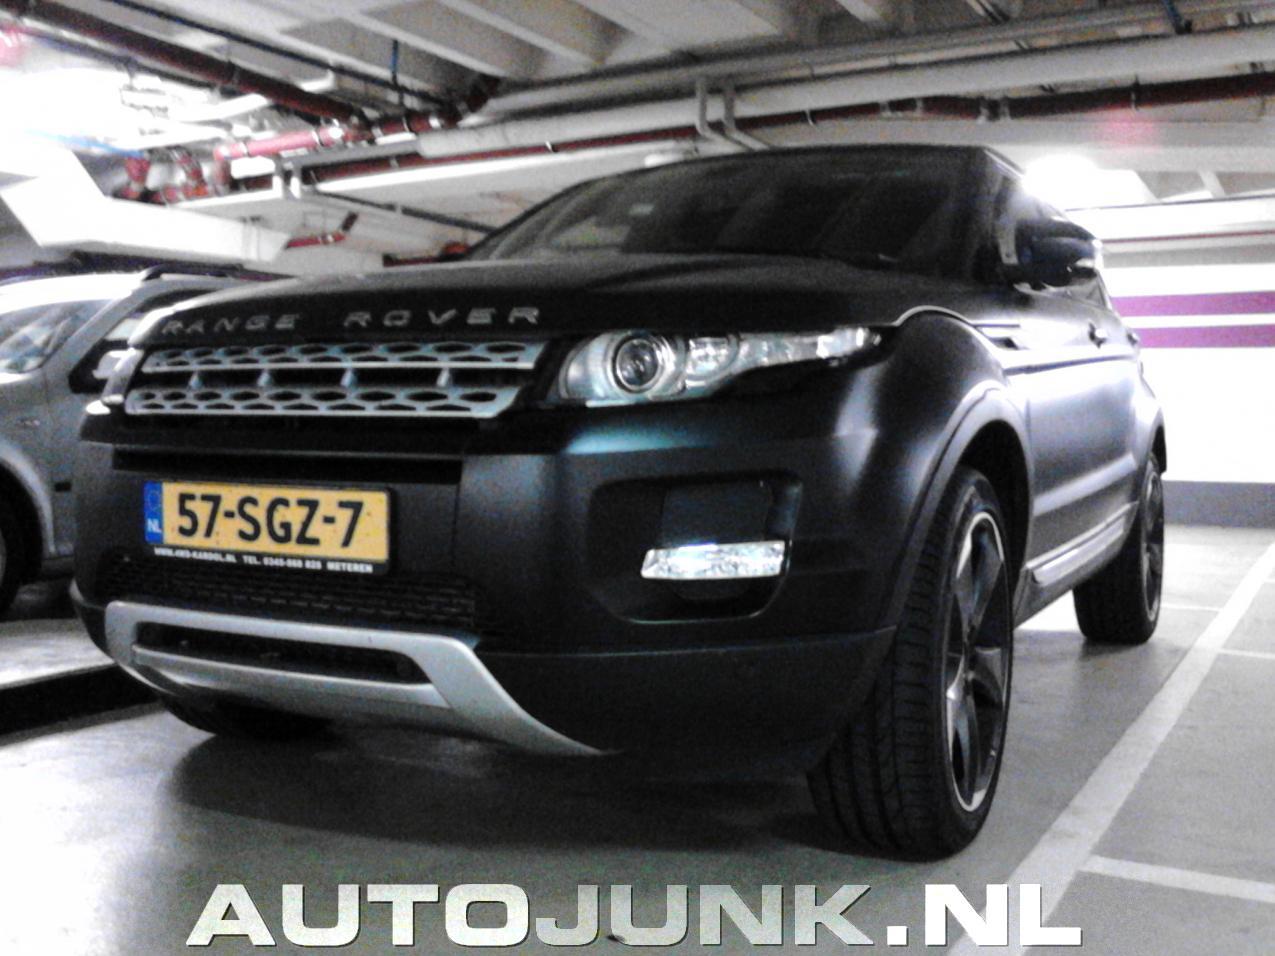 Beroemd Range Rover Evoque foto's » Autojunk.nl (81669) YQ33